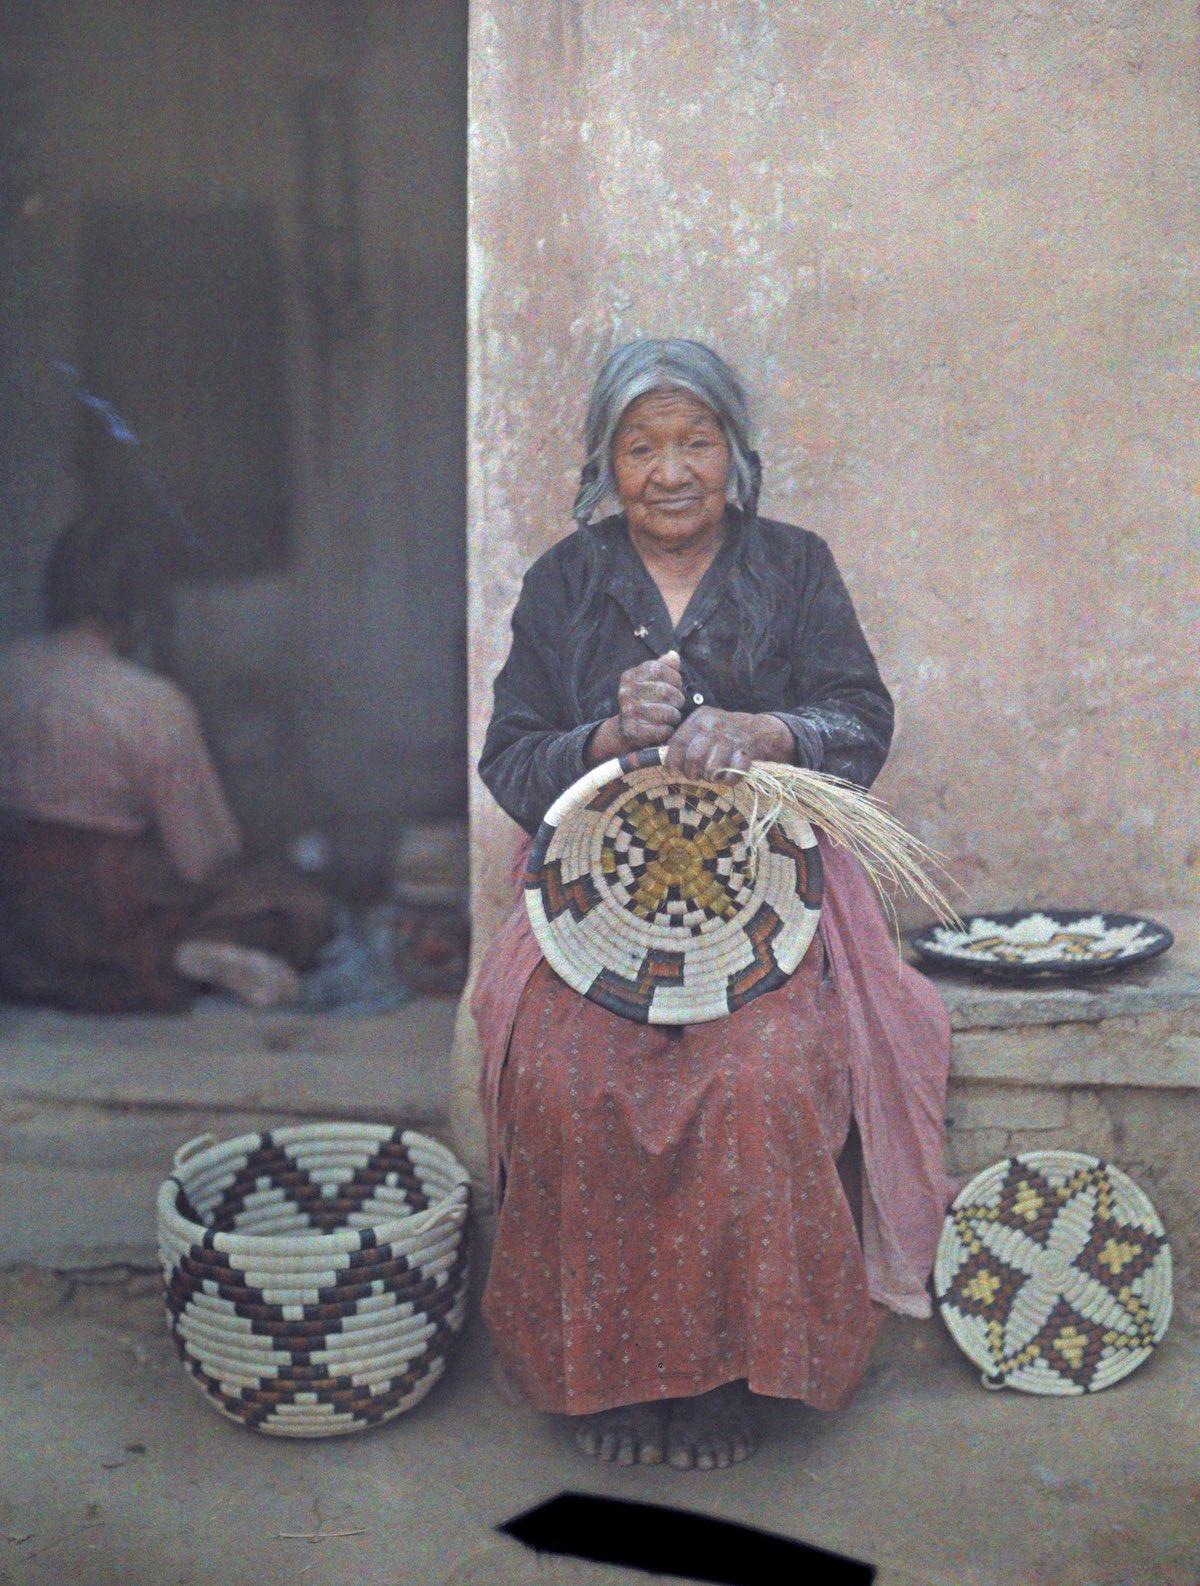 Portrait of a Hopi Indian 1920s